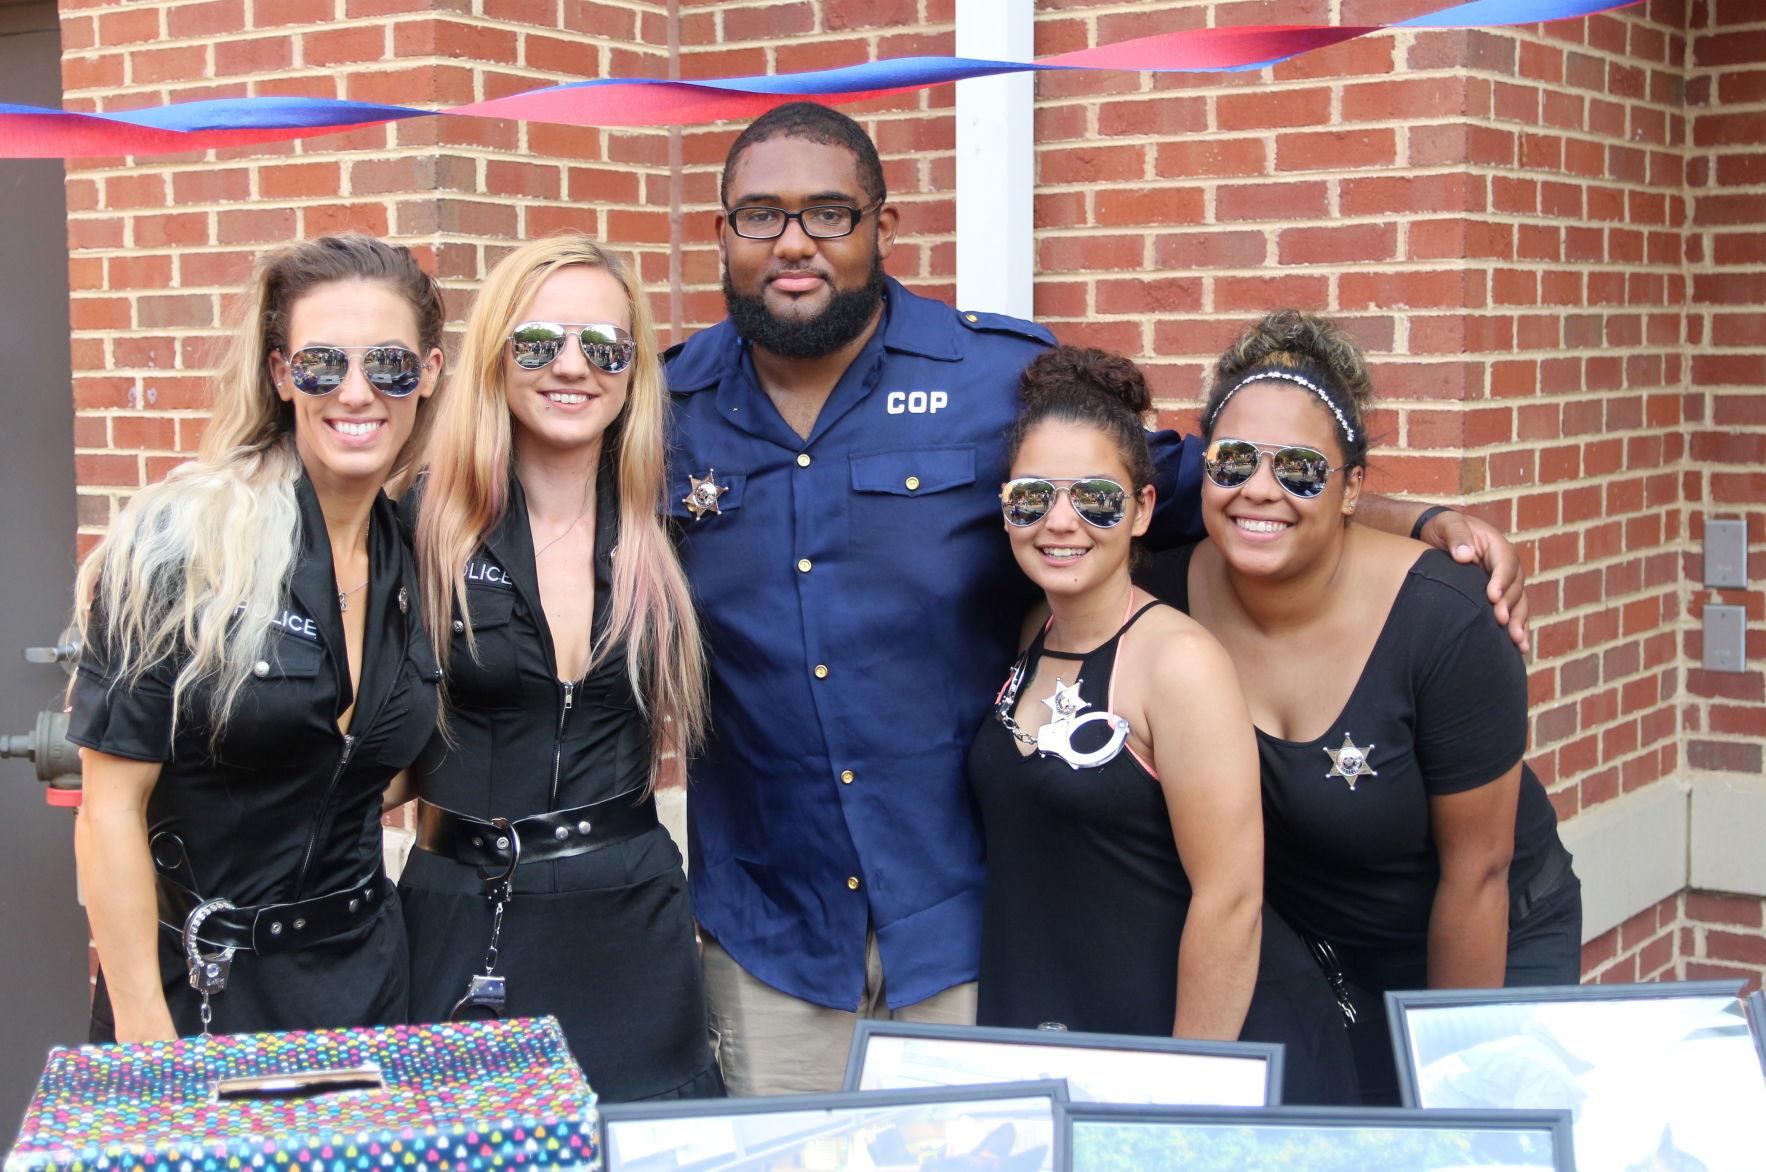 Battle of the Bars raises $15,000 for local charities | Newark Post